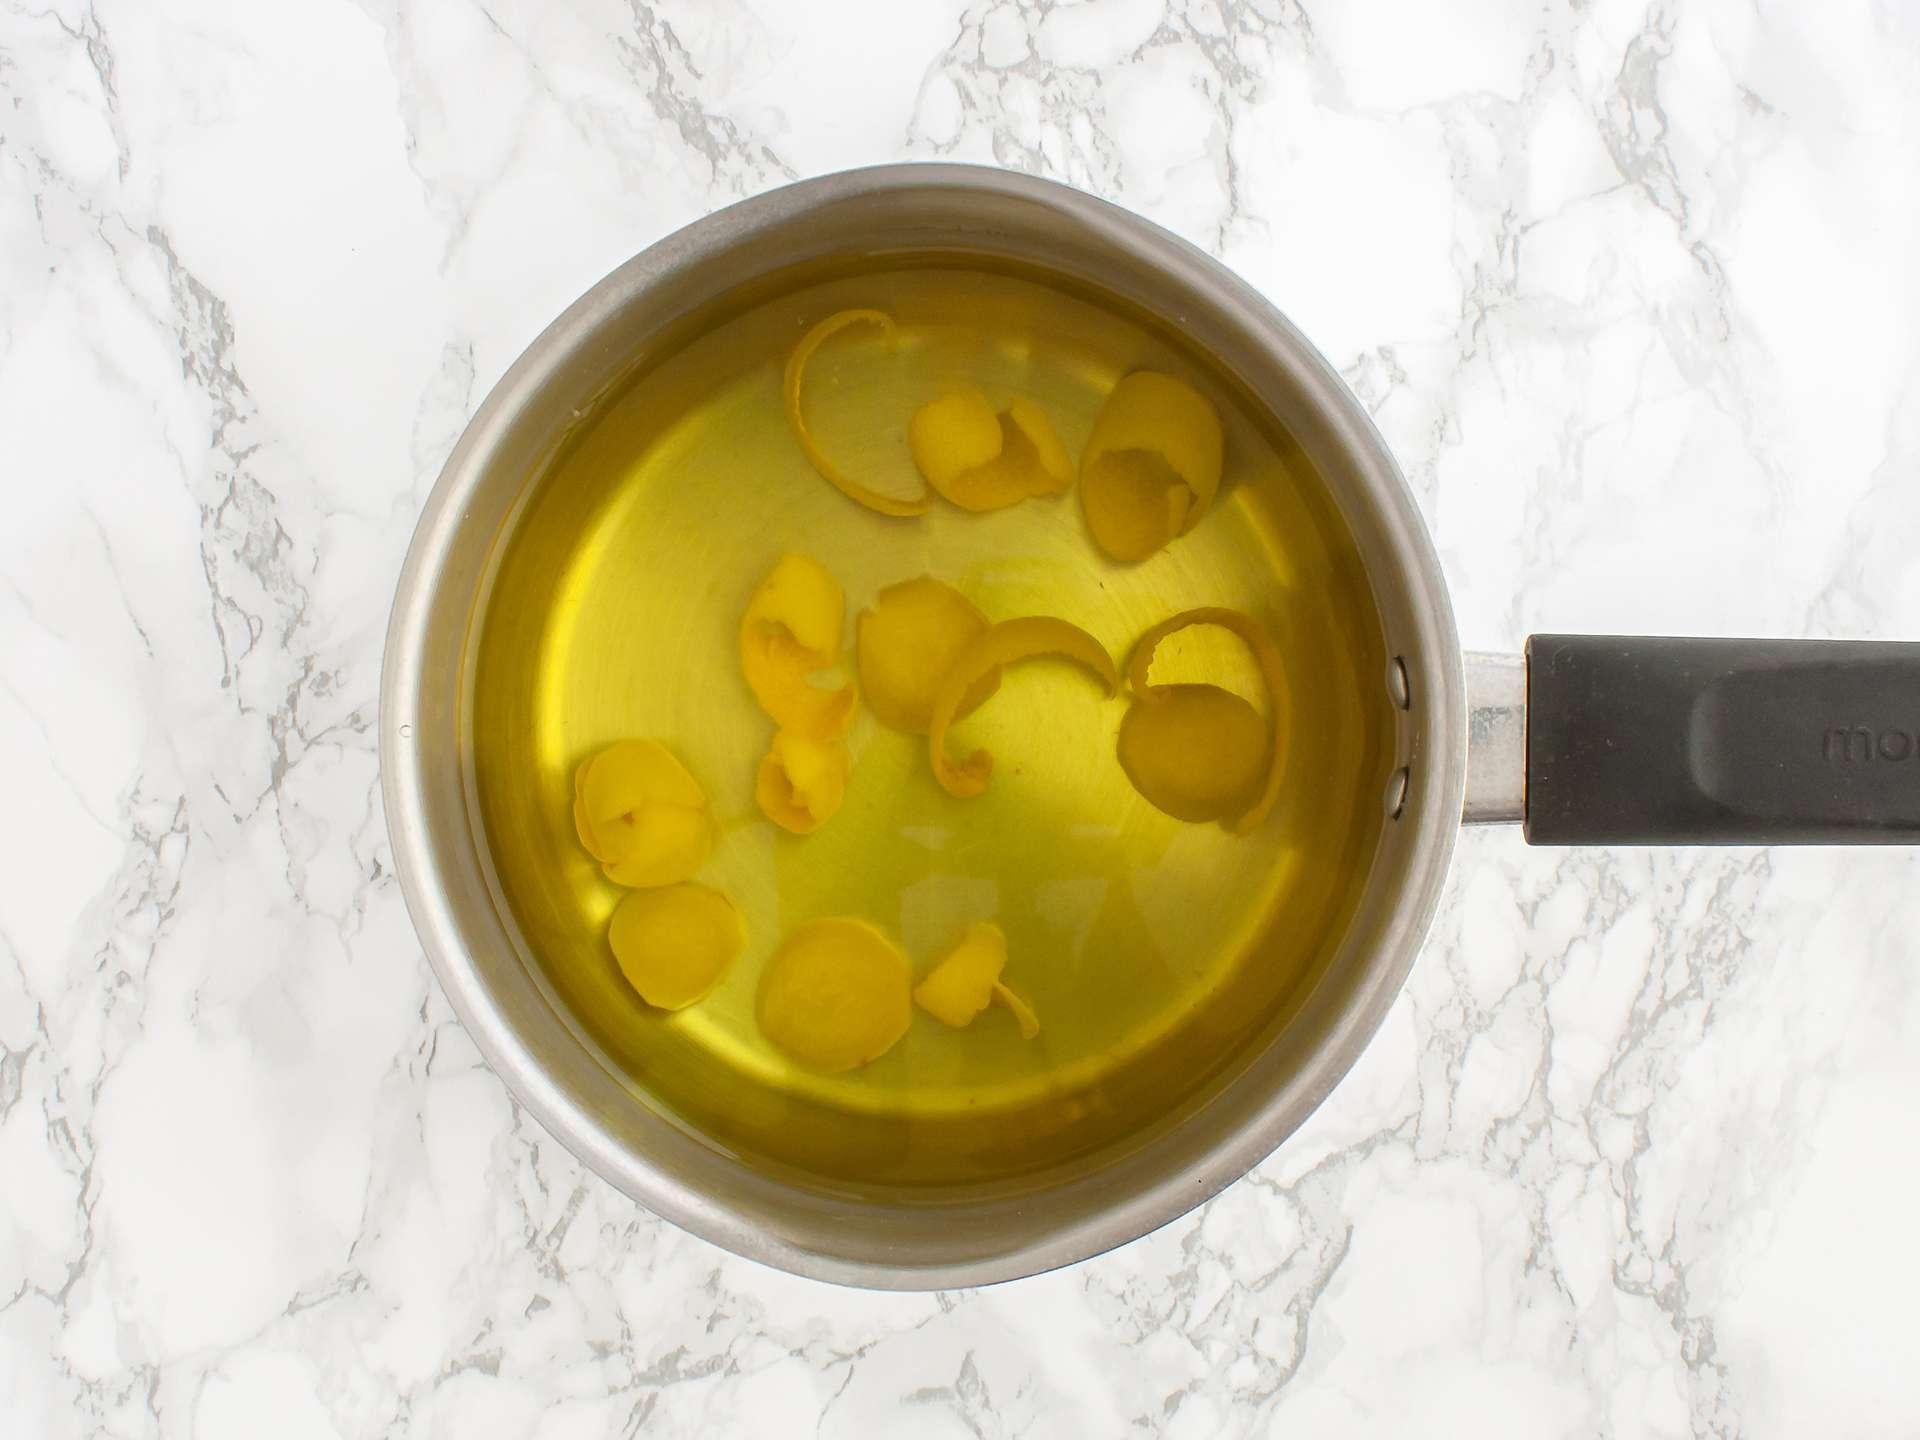 Boiled lemon peel.